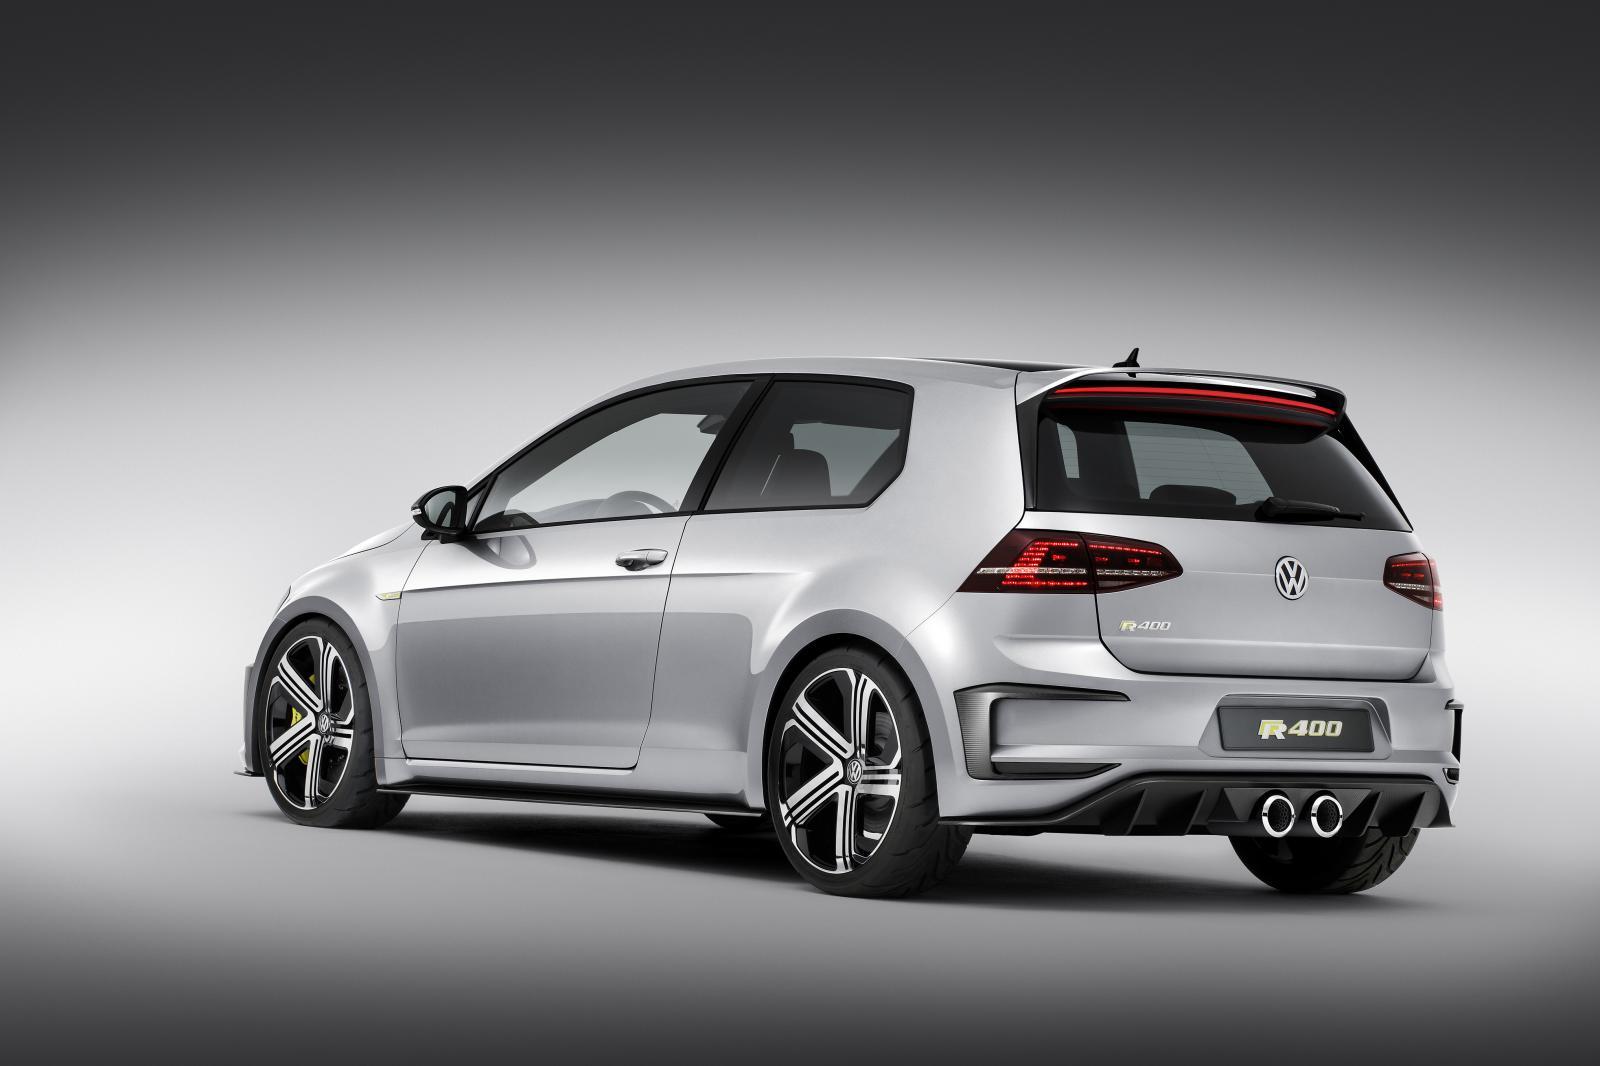 S0-Pekin-2014-Volkswagen-Golf-R400-Studie-400-ch-pour-une-Golf-319256